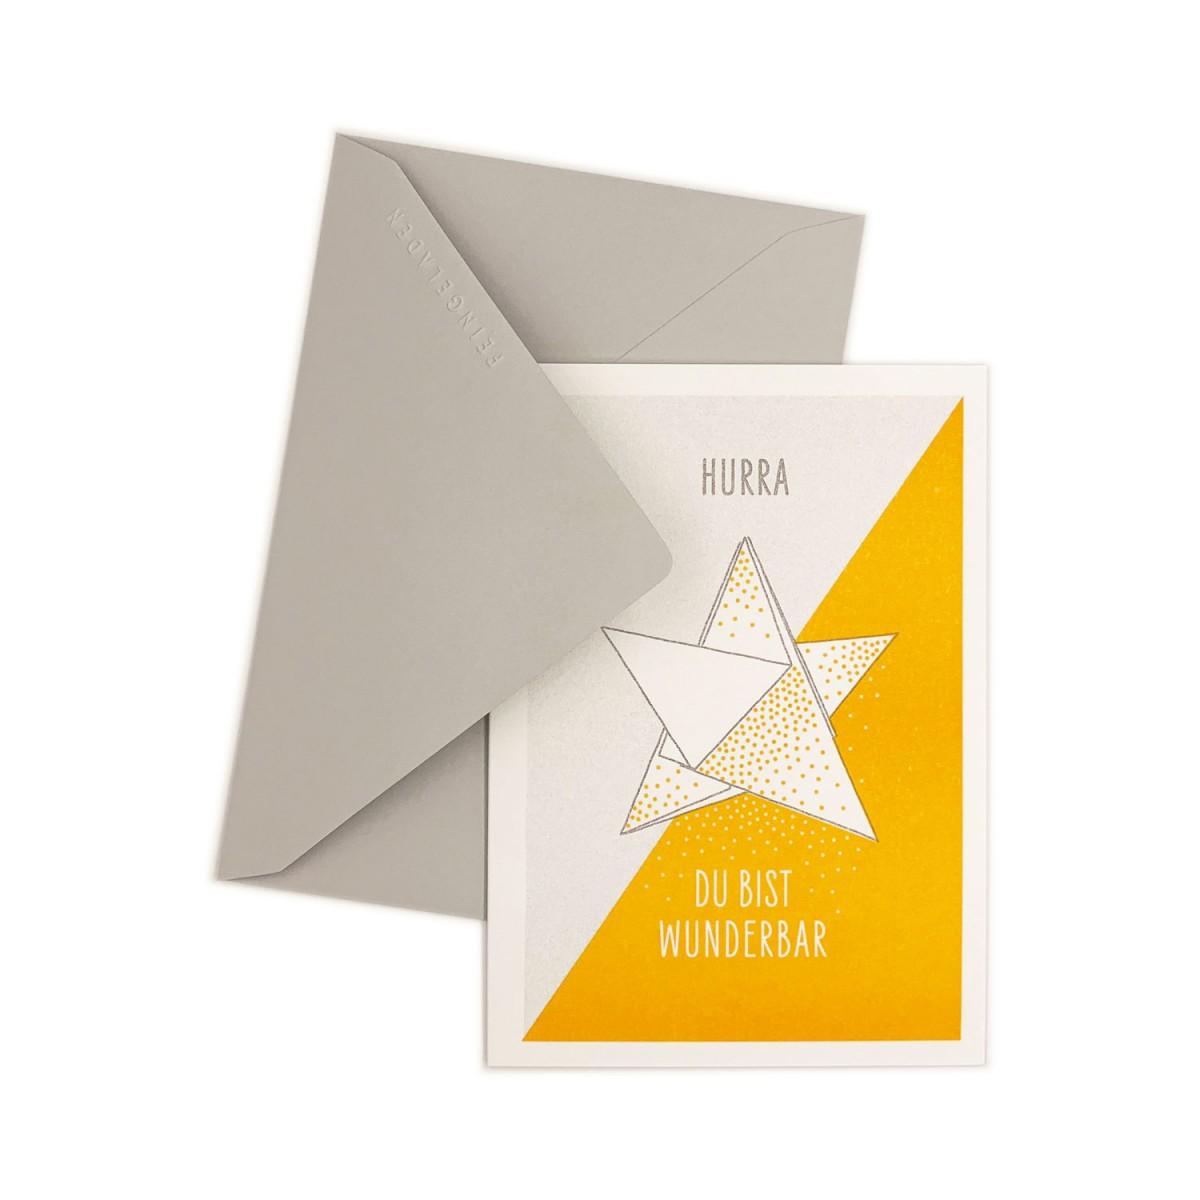 Feingeladen // LIKE ORIGAMI // Star »Hurra, du bist wunderbar« (GRSF) // RISO-Klappkarte, A6